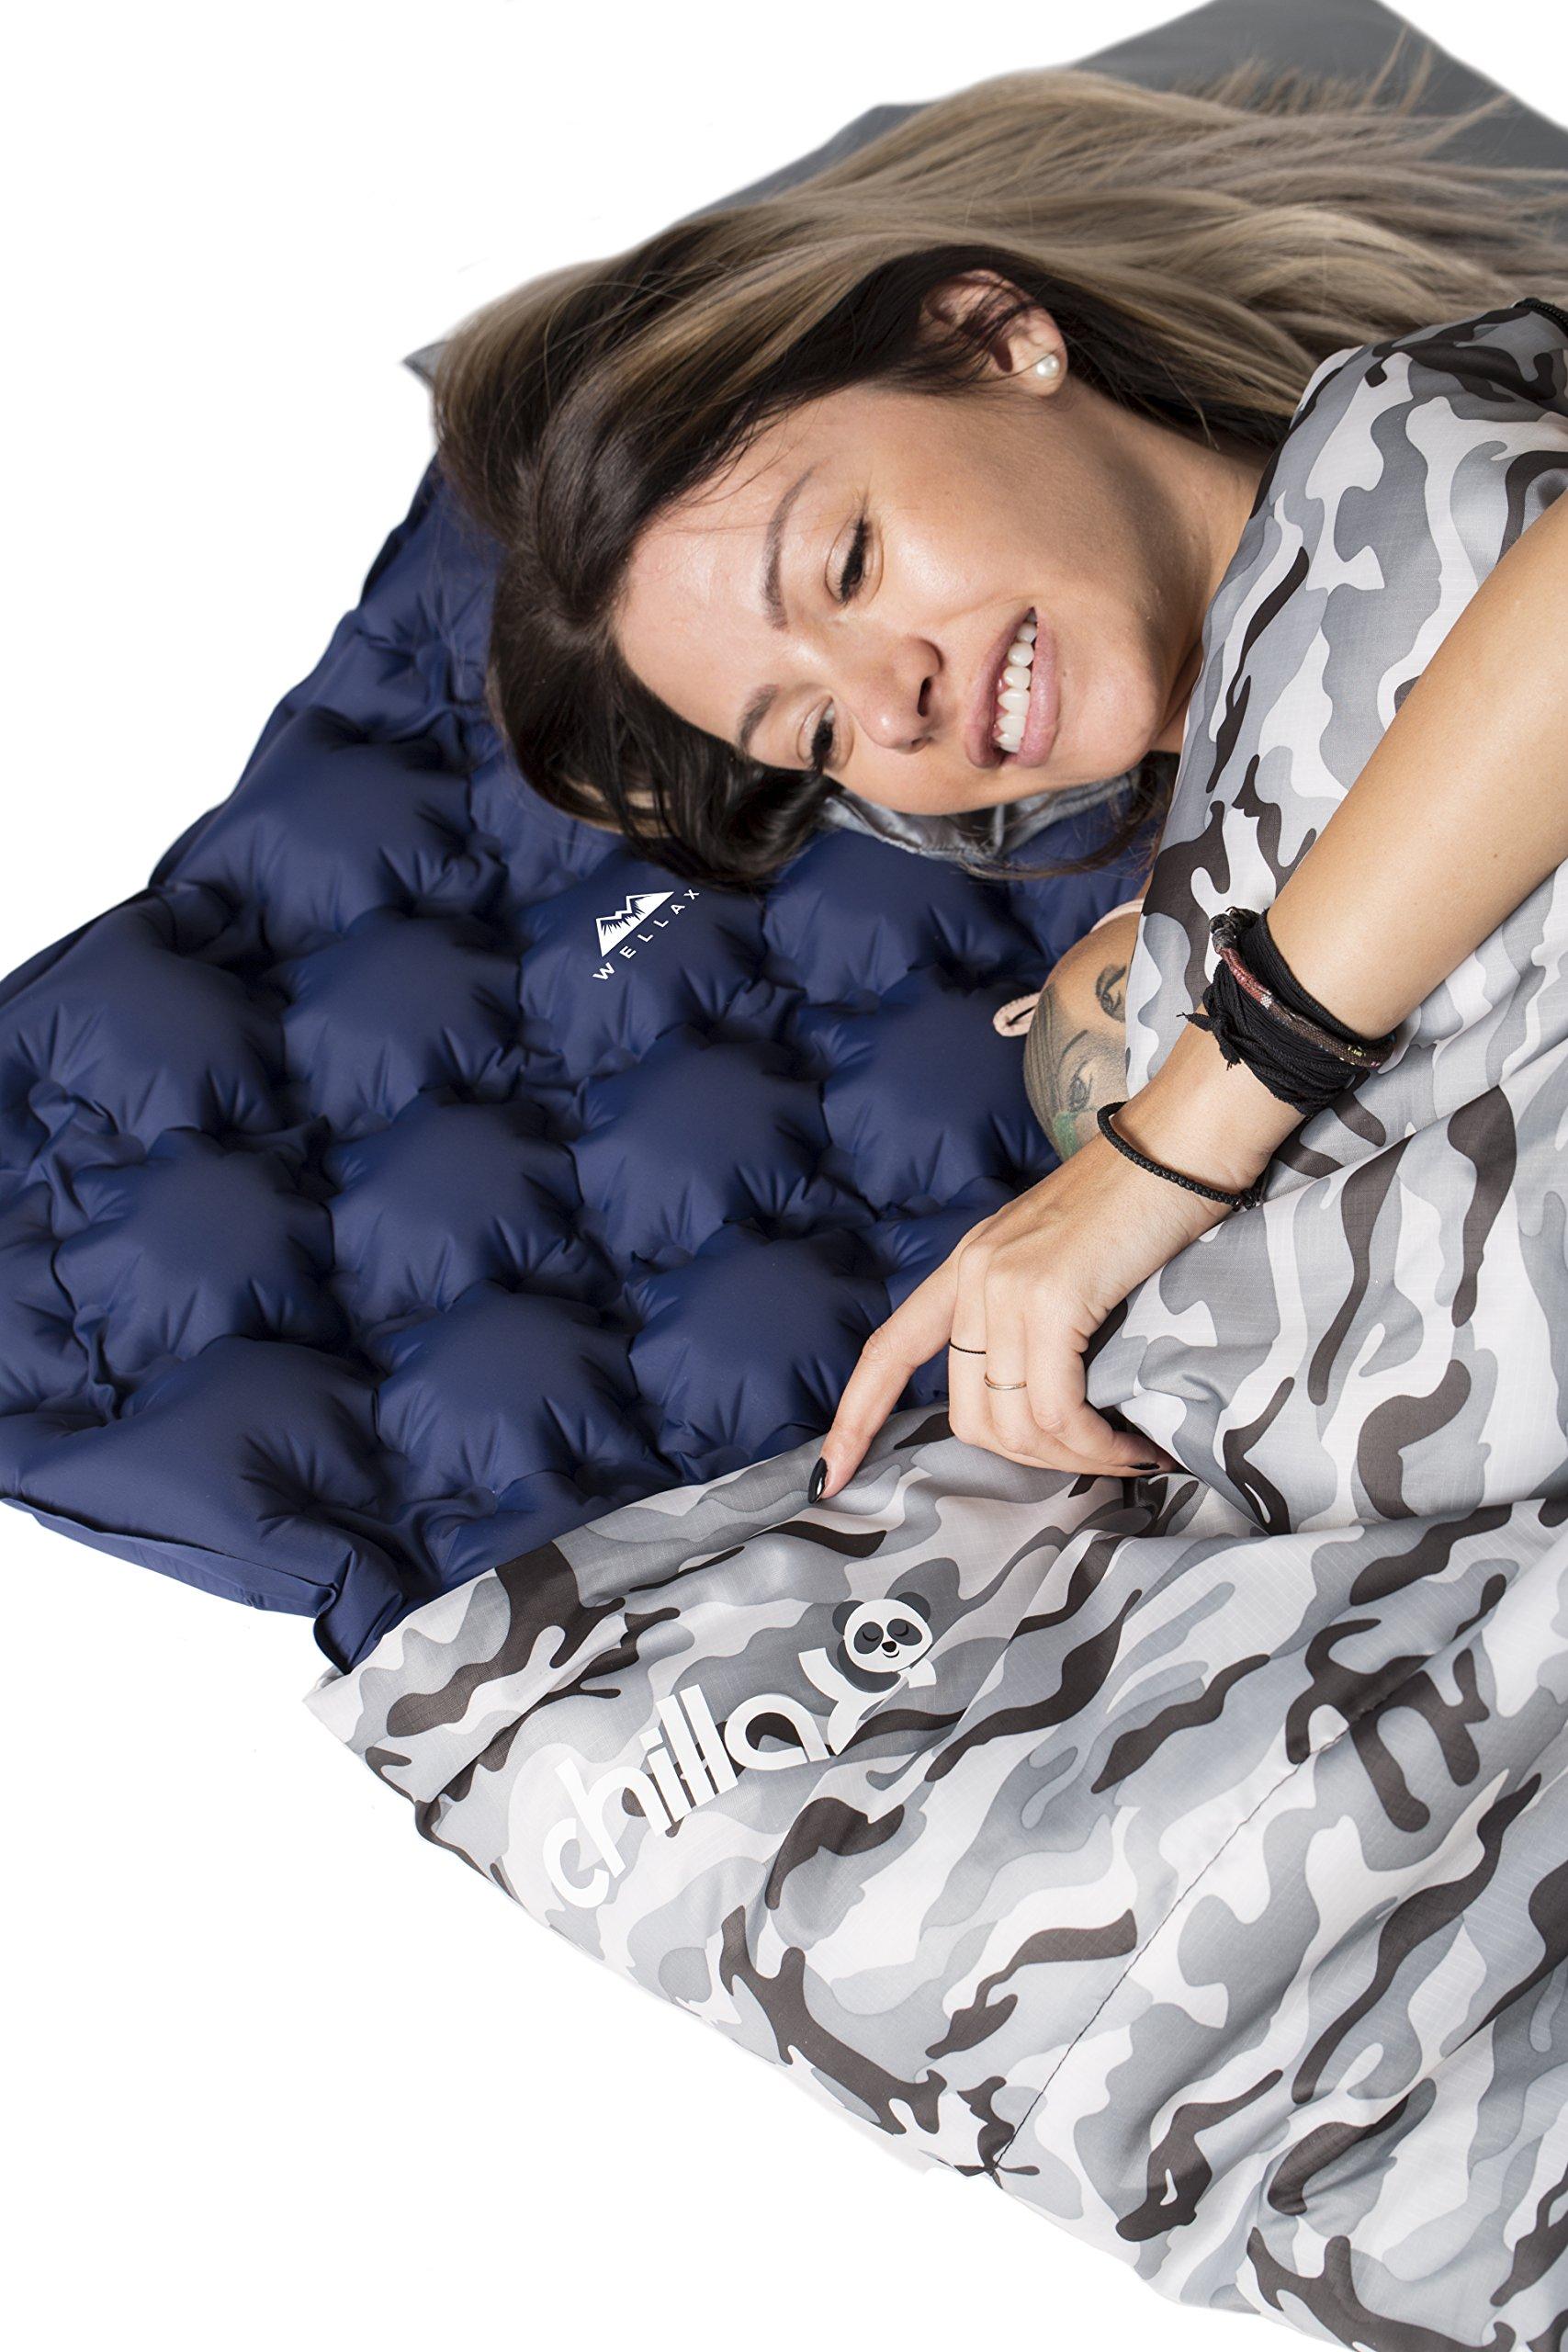 WELLAX Ultralight Air Sleeping Pad - Inflatable Camping ...